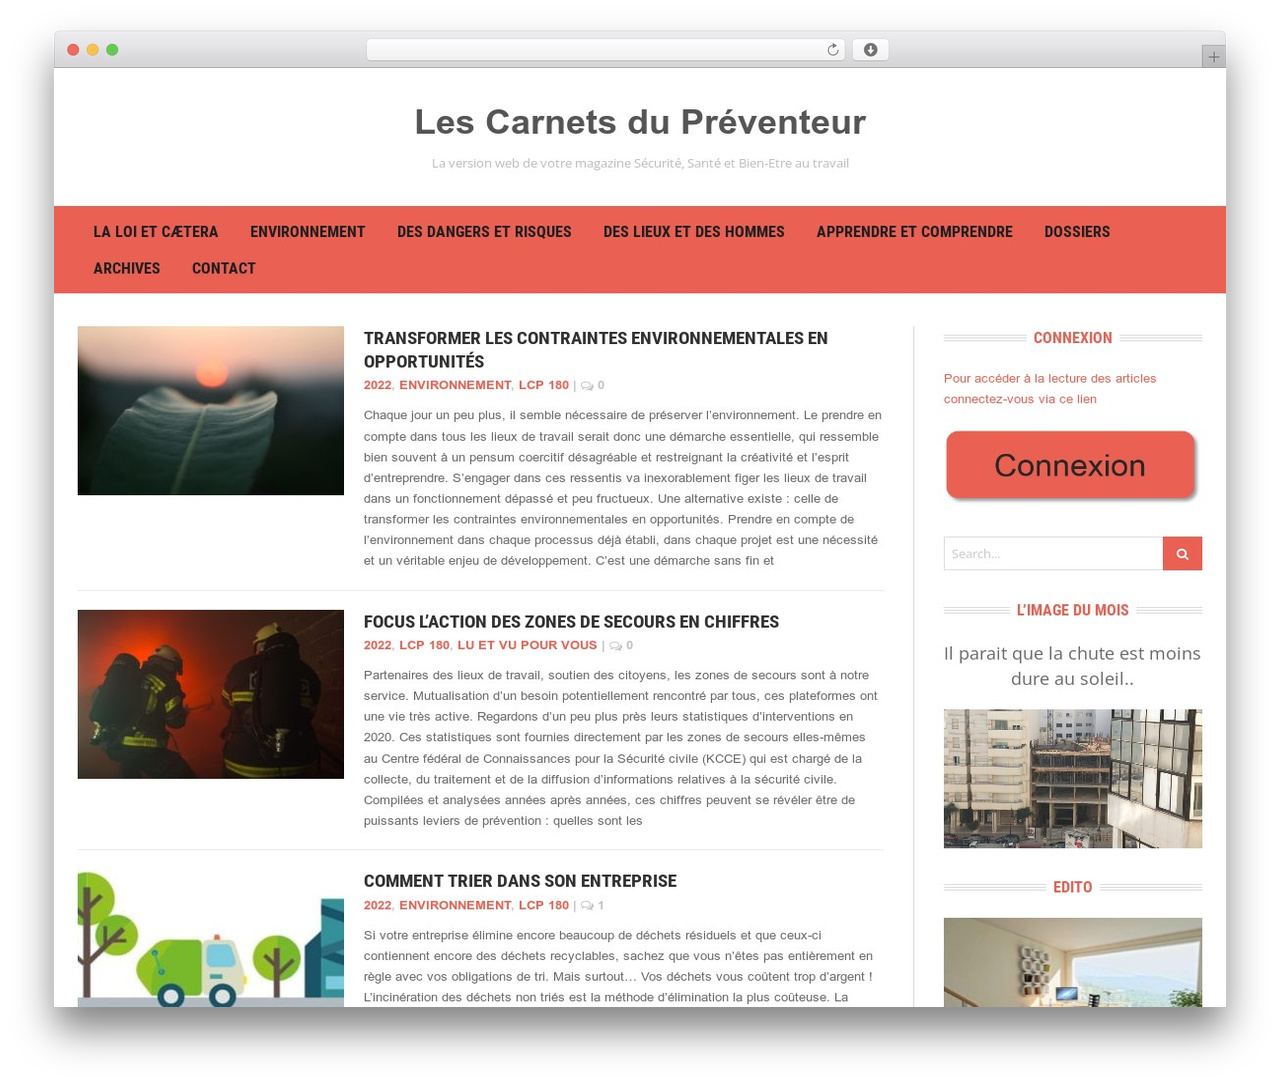 Headline News WordPress template - lescarnets.be/les-carnets